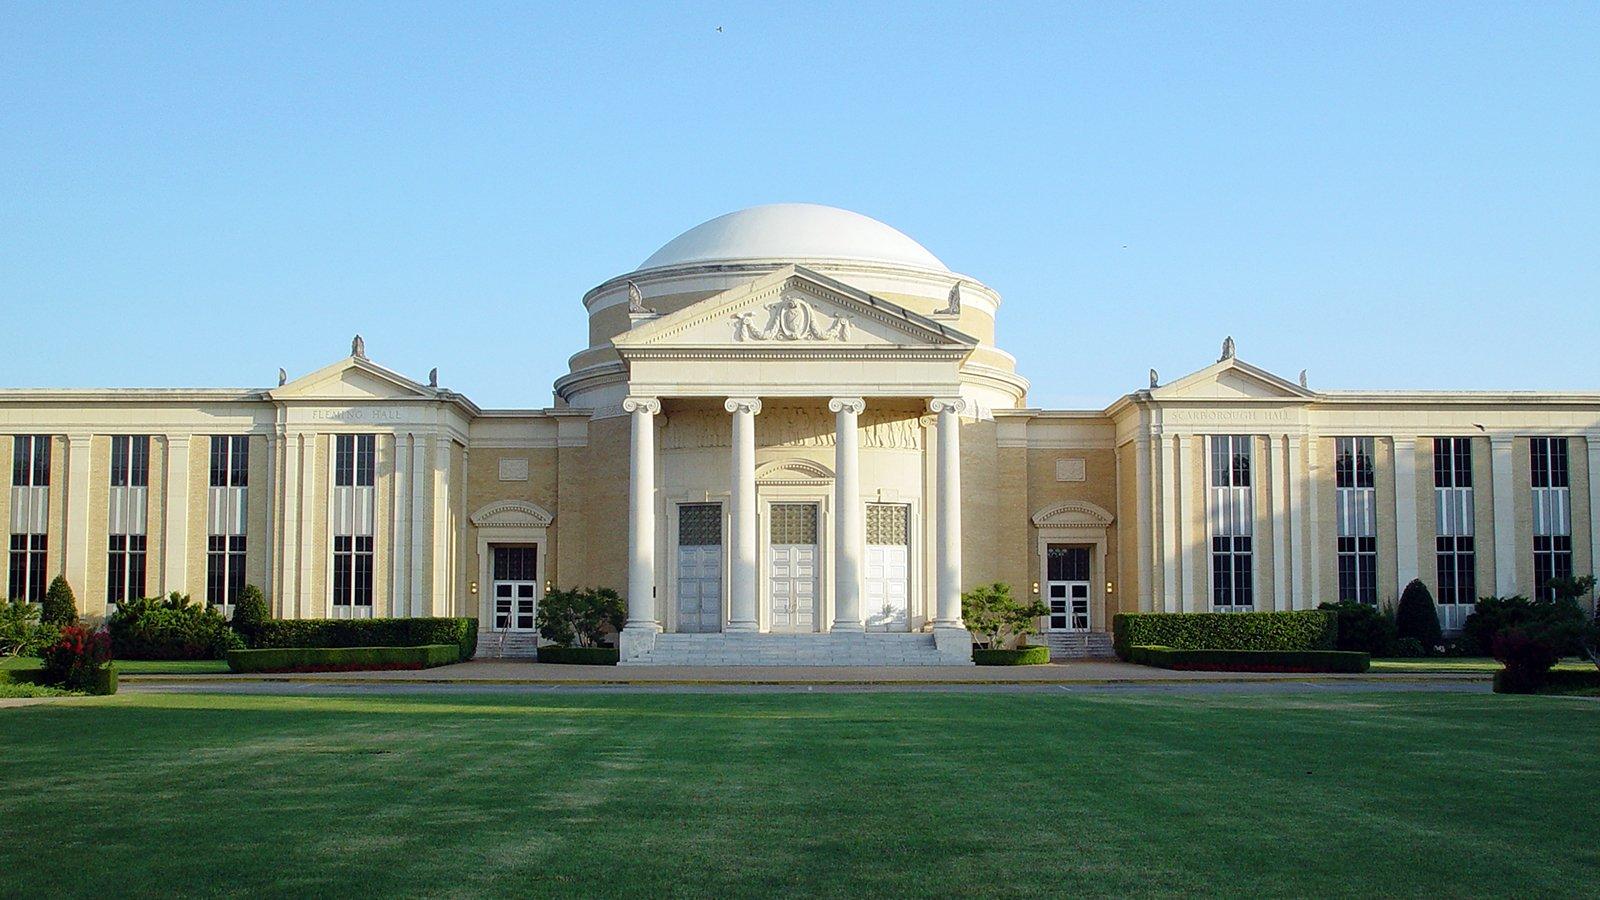 The BH Carroll Memorial Building Rotunda at Southwestern Baptist Theological Seminary in Fort Worth, Texas. Photo by Michael-David Bradford/Creative Commons